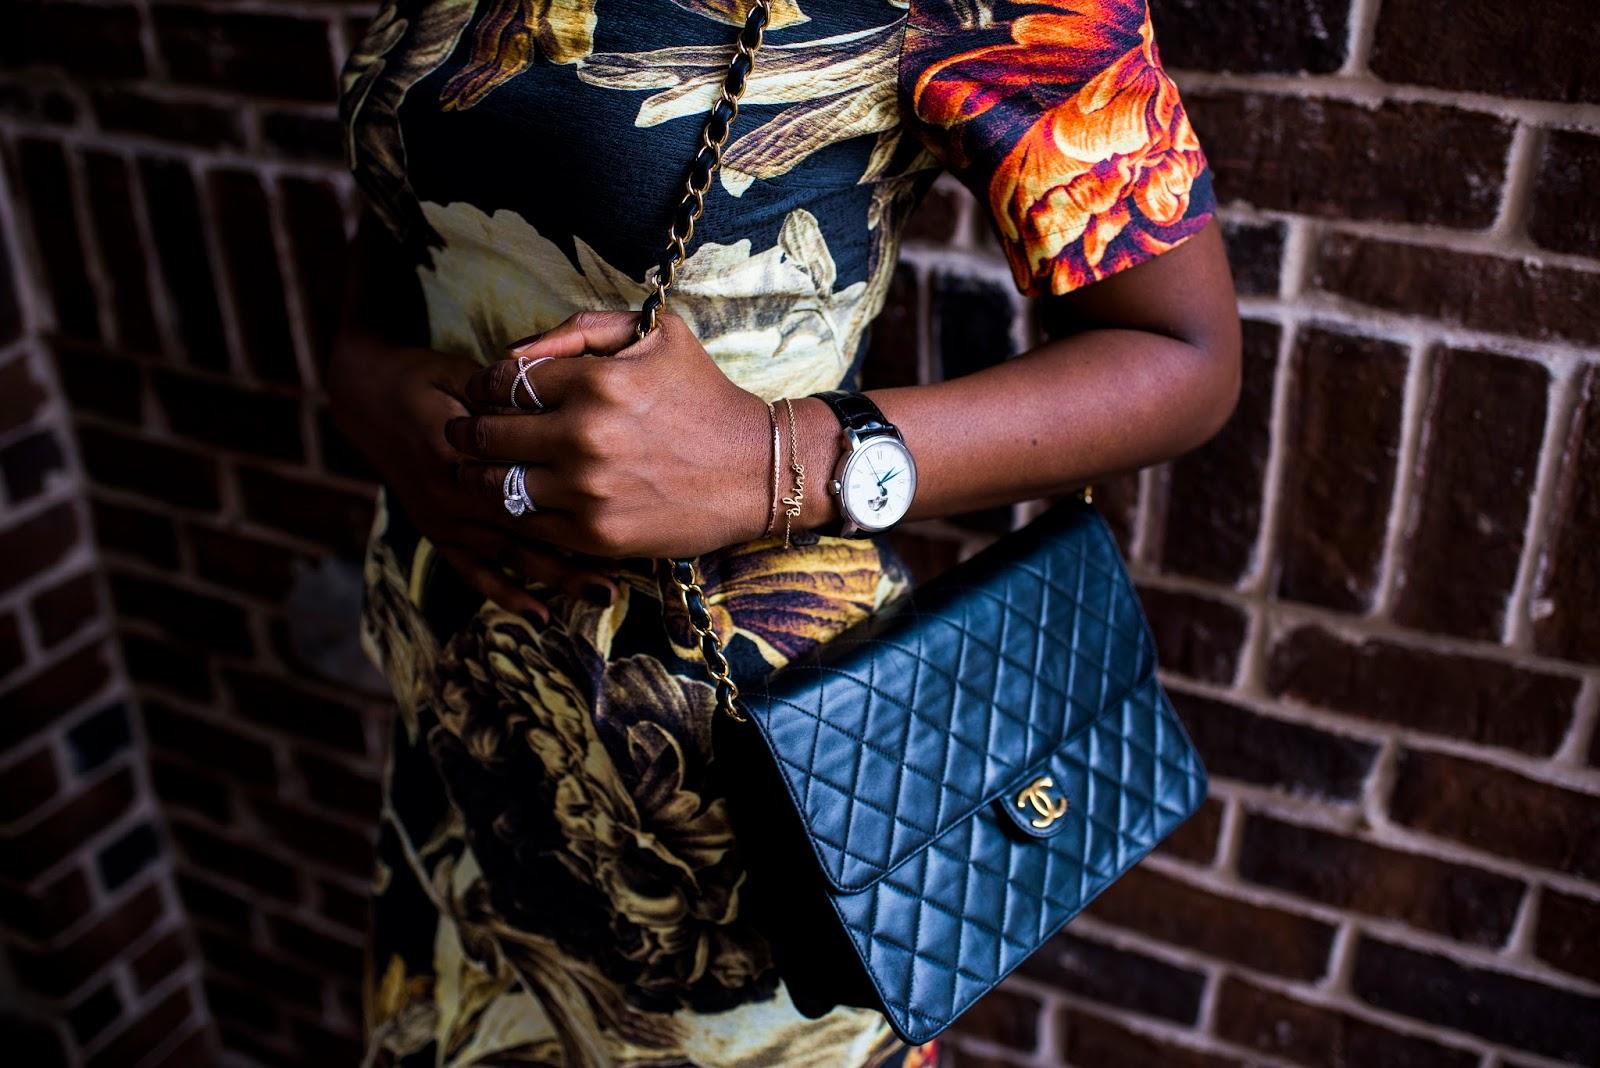 Fall Fashion trend: Floral dress